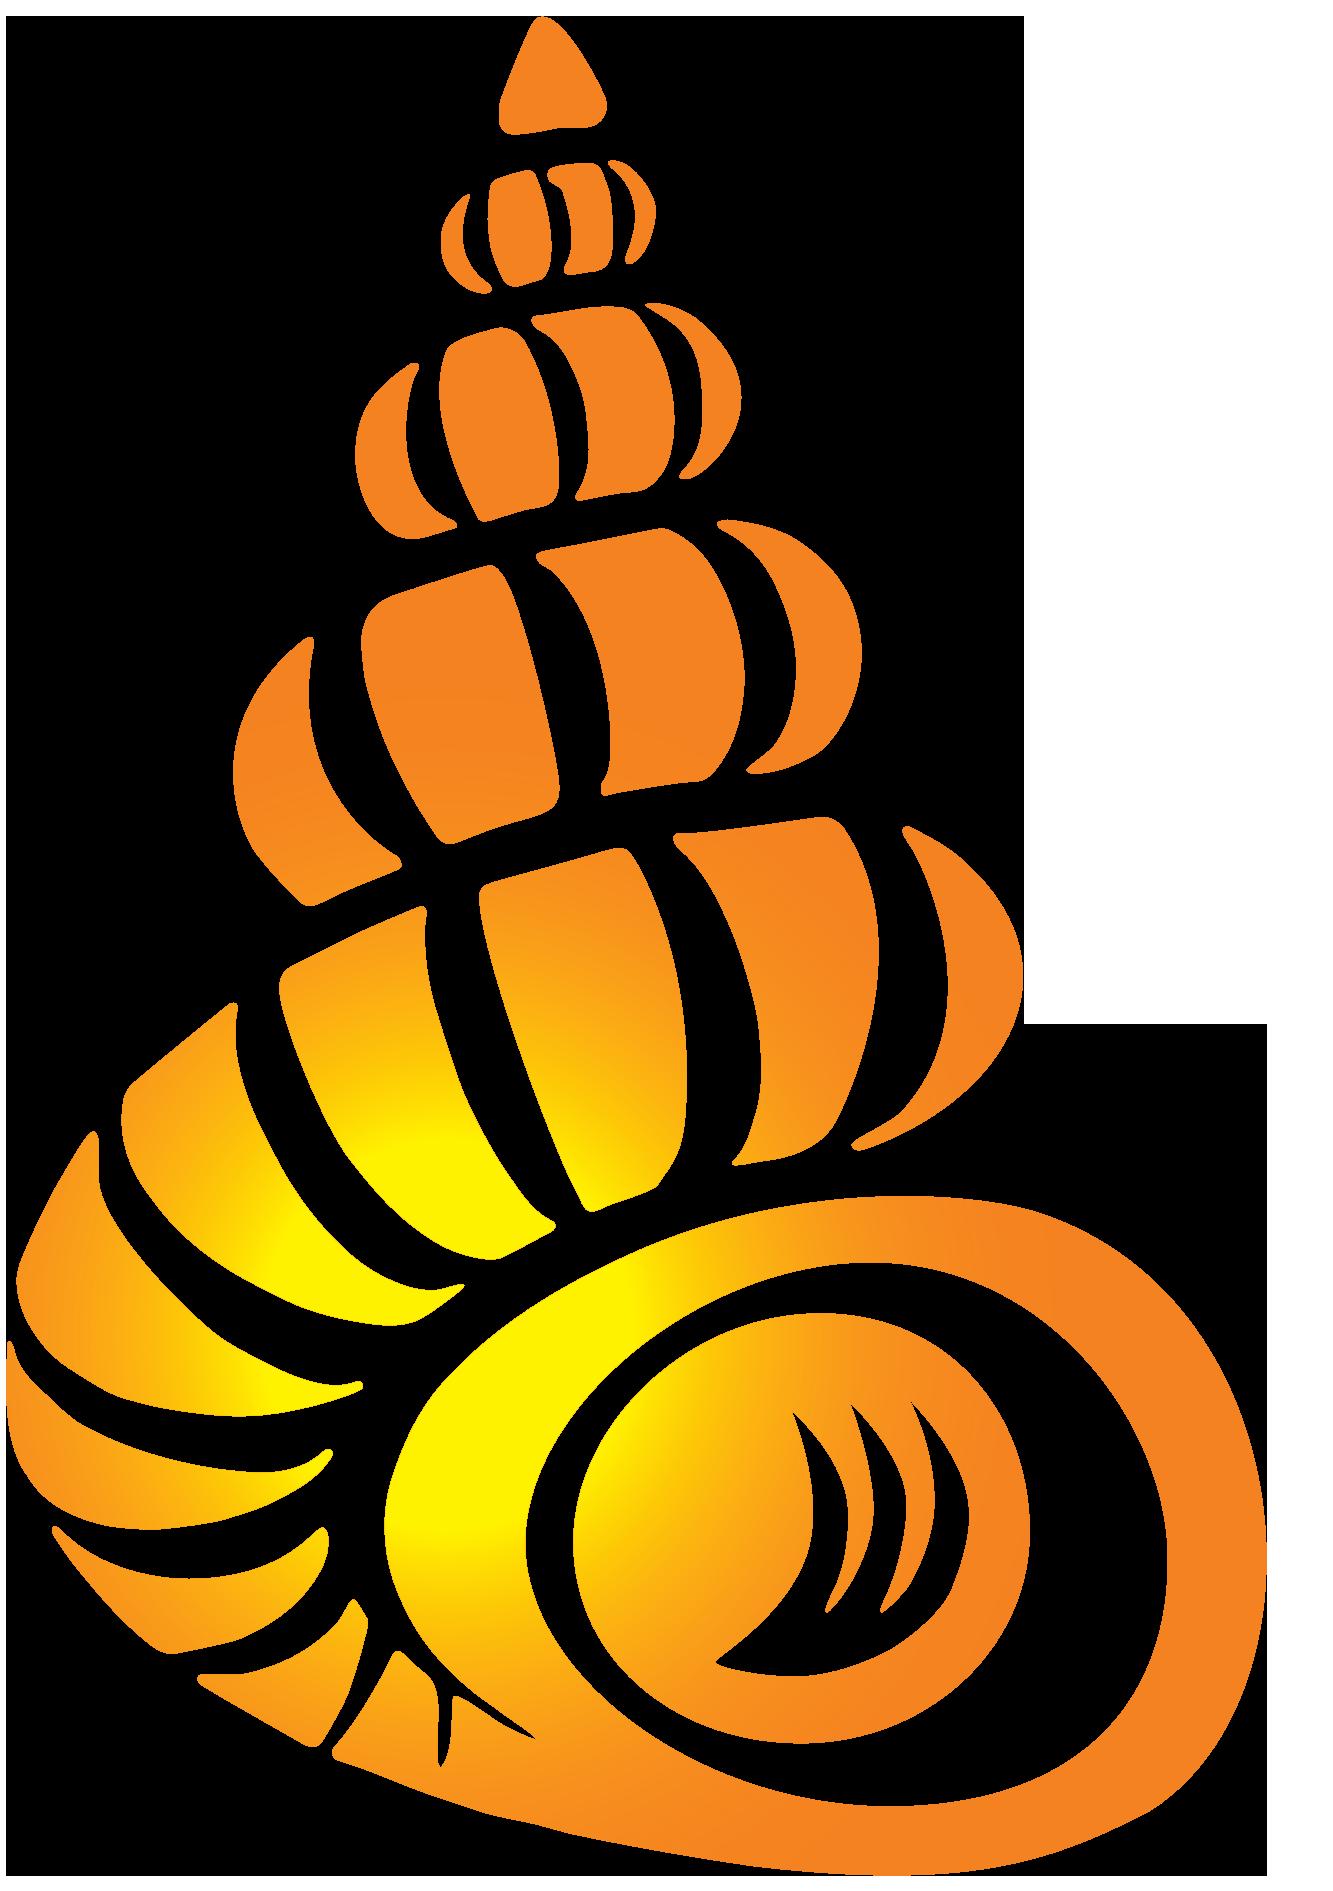 Bailey matthews national shell. Florida clipart vacation florida